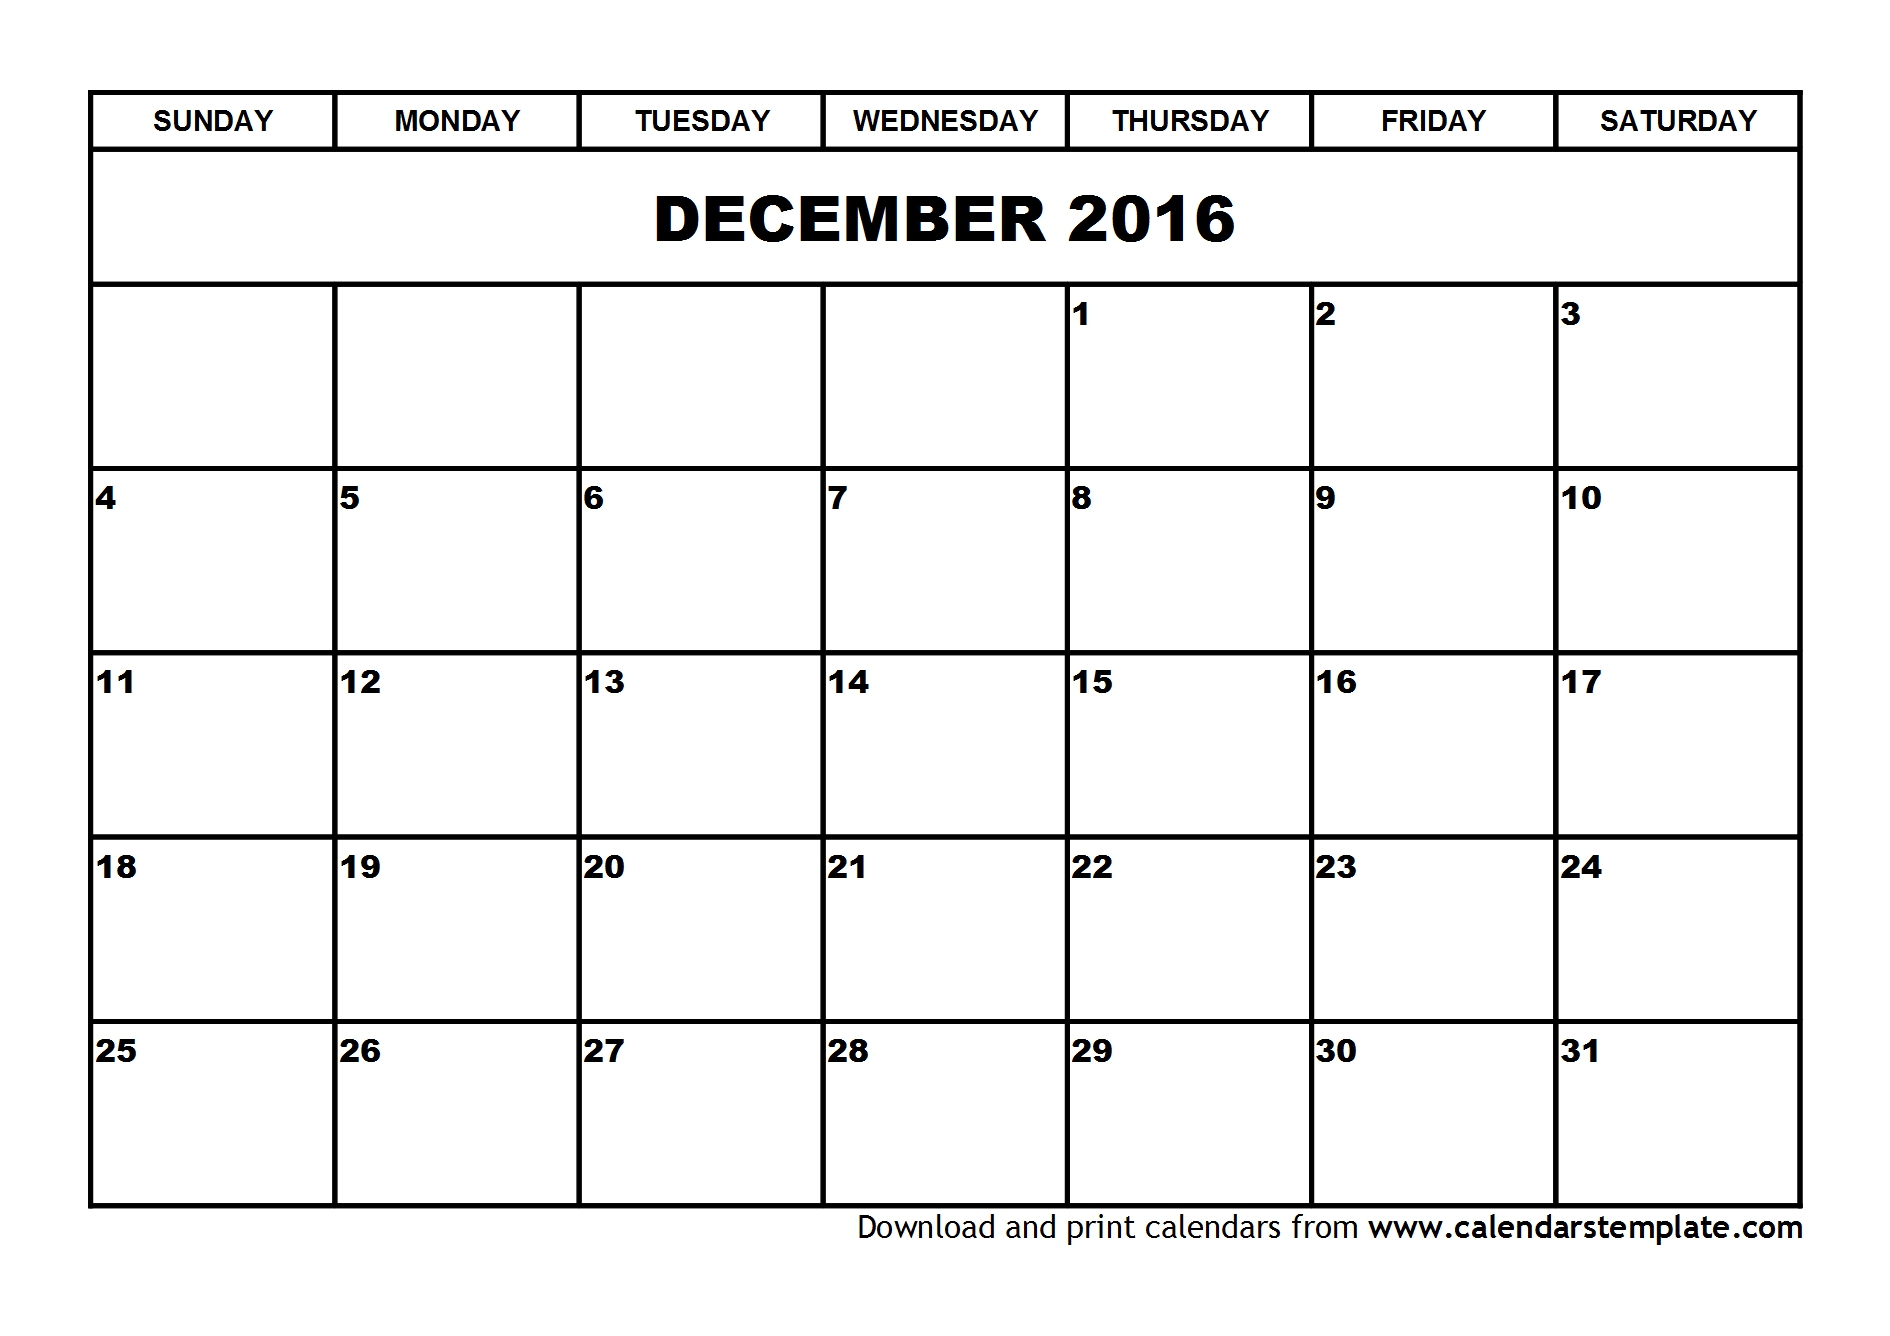 009 Blank Calendar Template Ideas November Printable December Pdf inside Blank Calendar Printable December